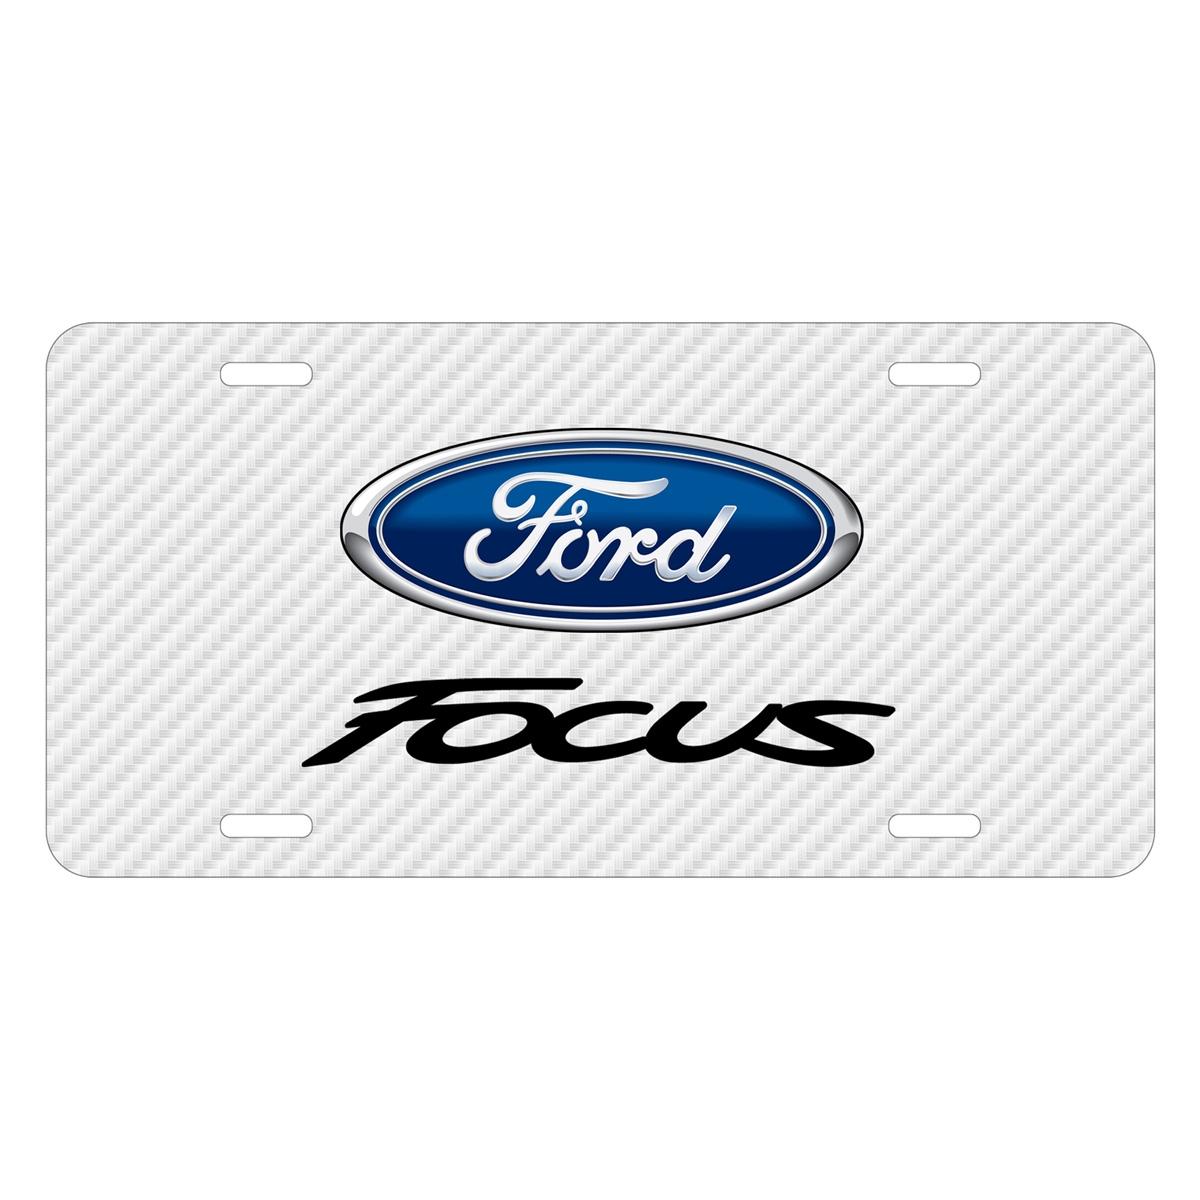 Ford Focus White Carbon Fiber Texture Graphic UV Metal License Plate